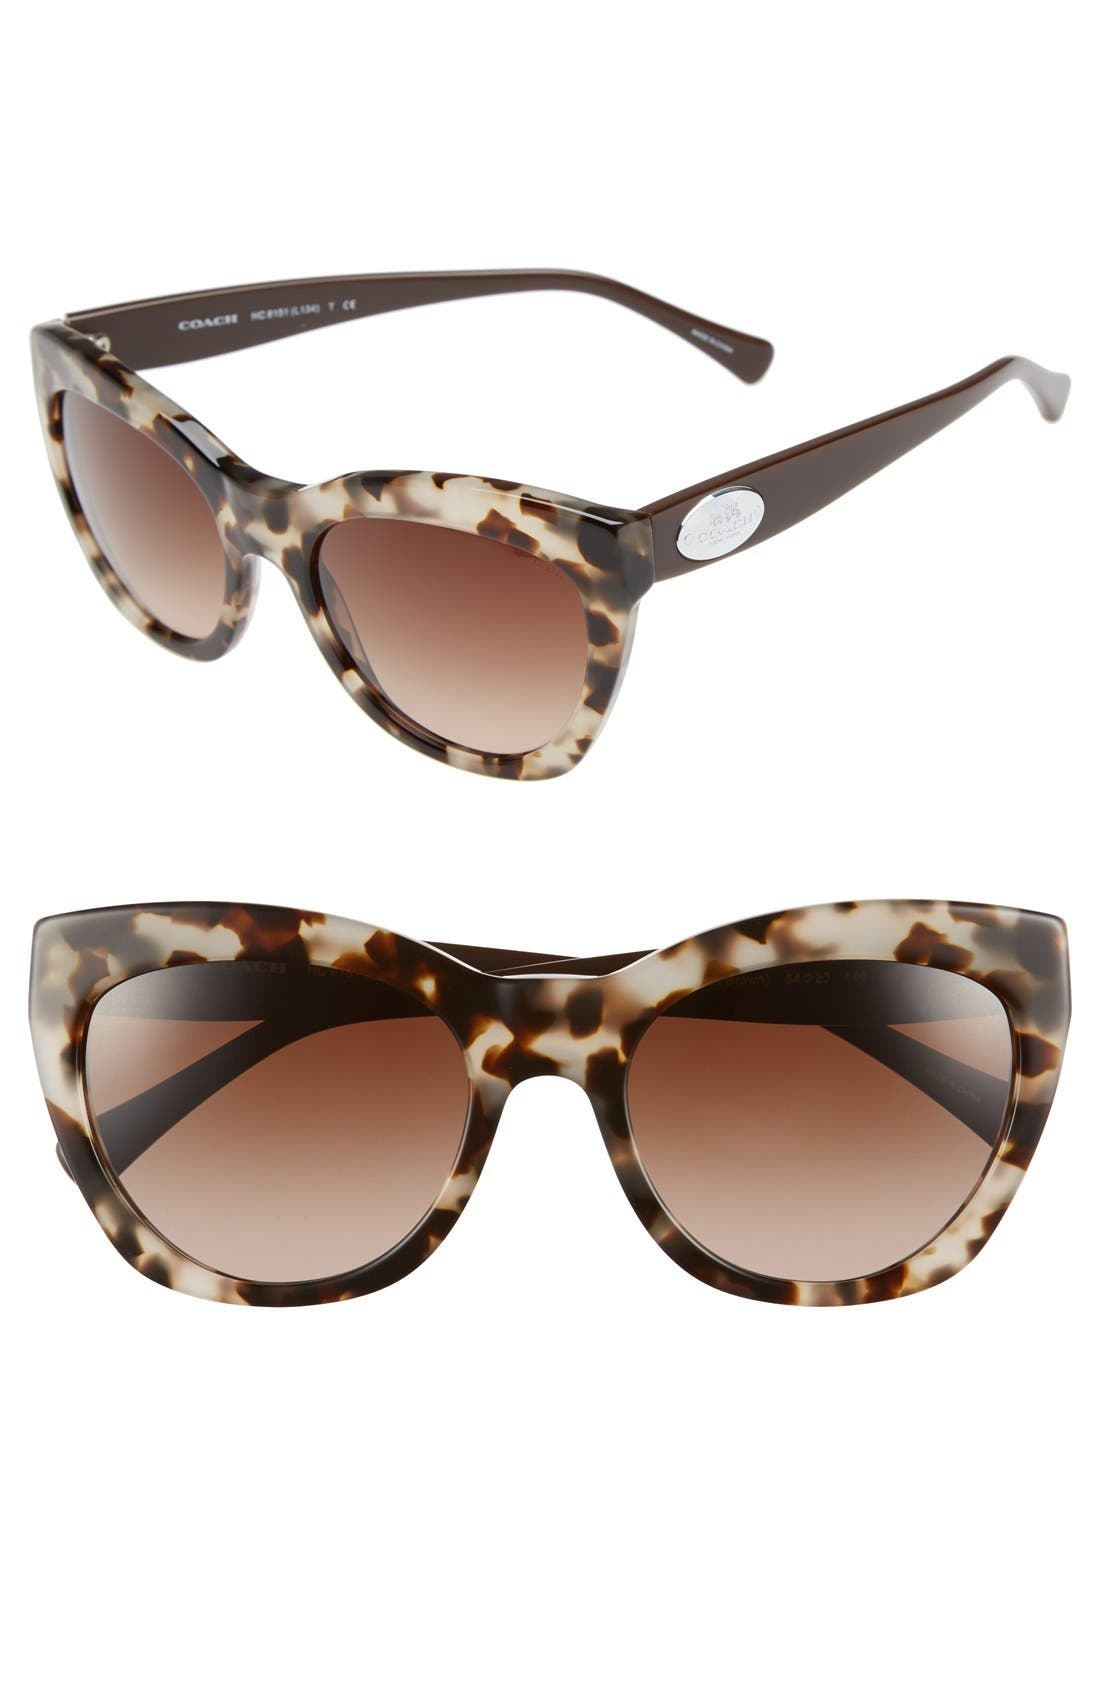 Main Image - COACH 54mm Retro Sunglasses